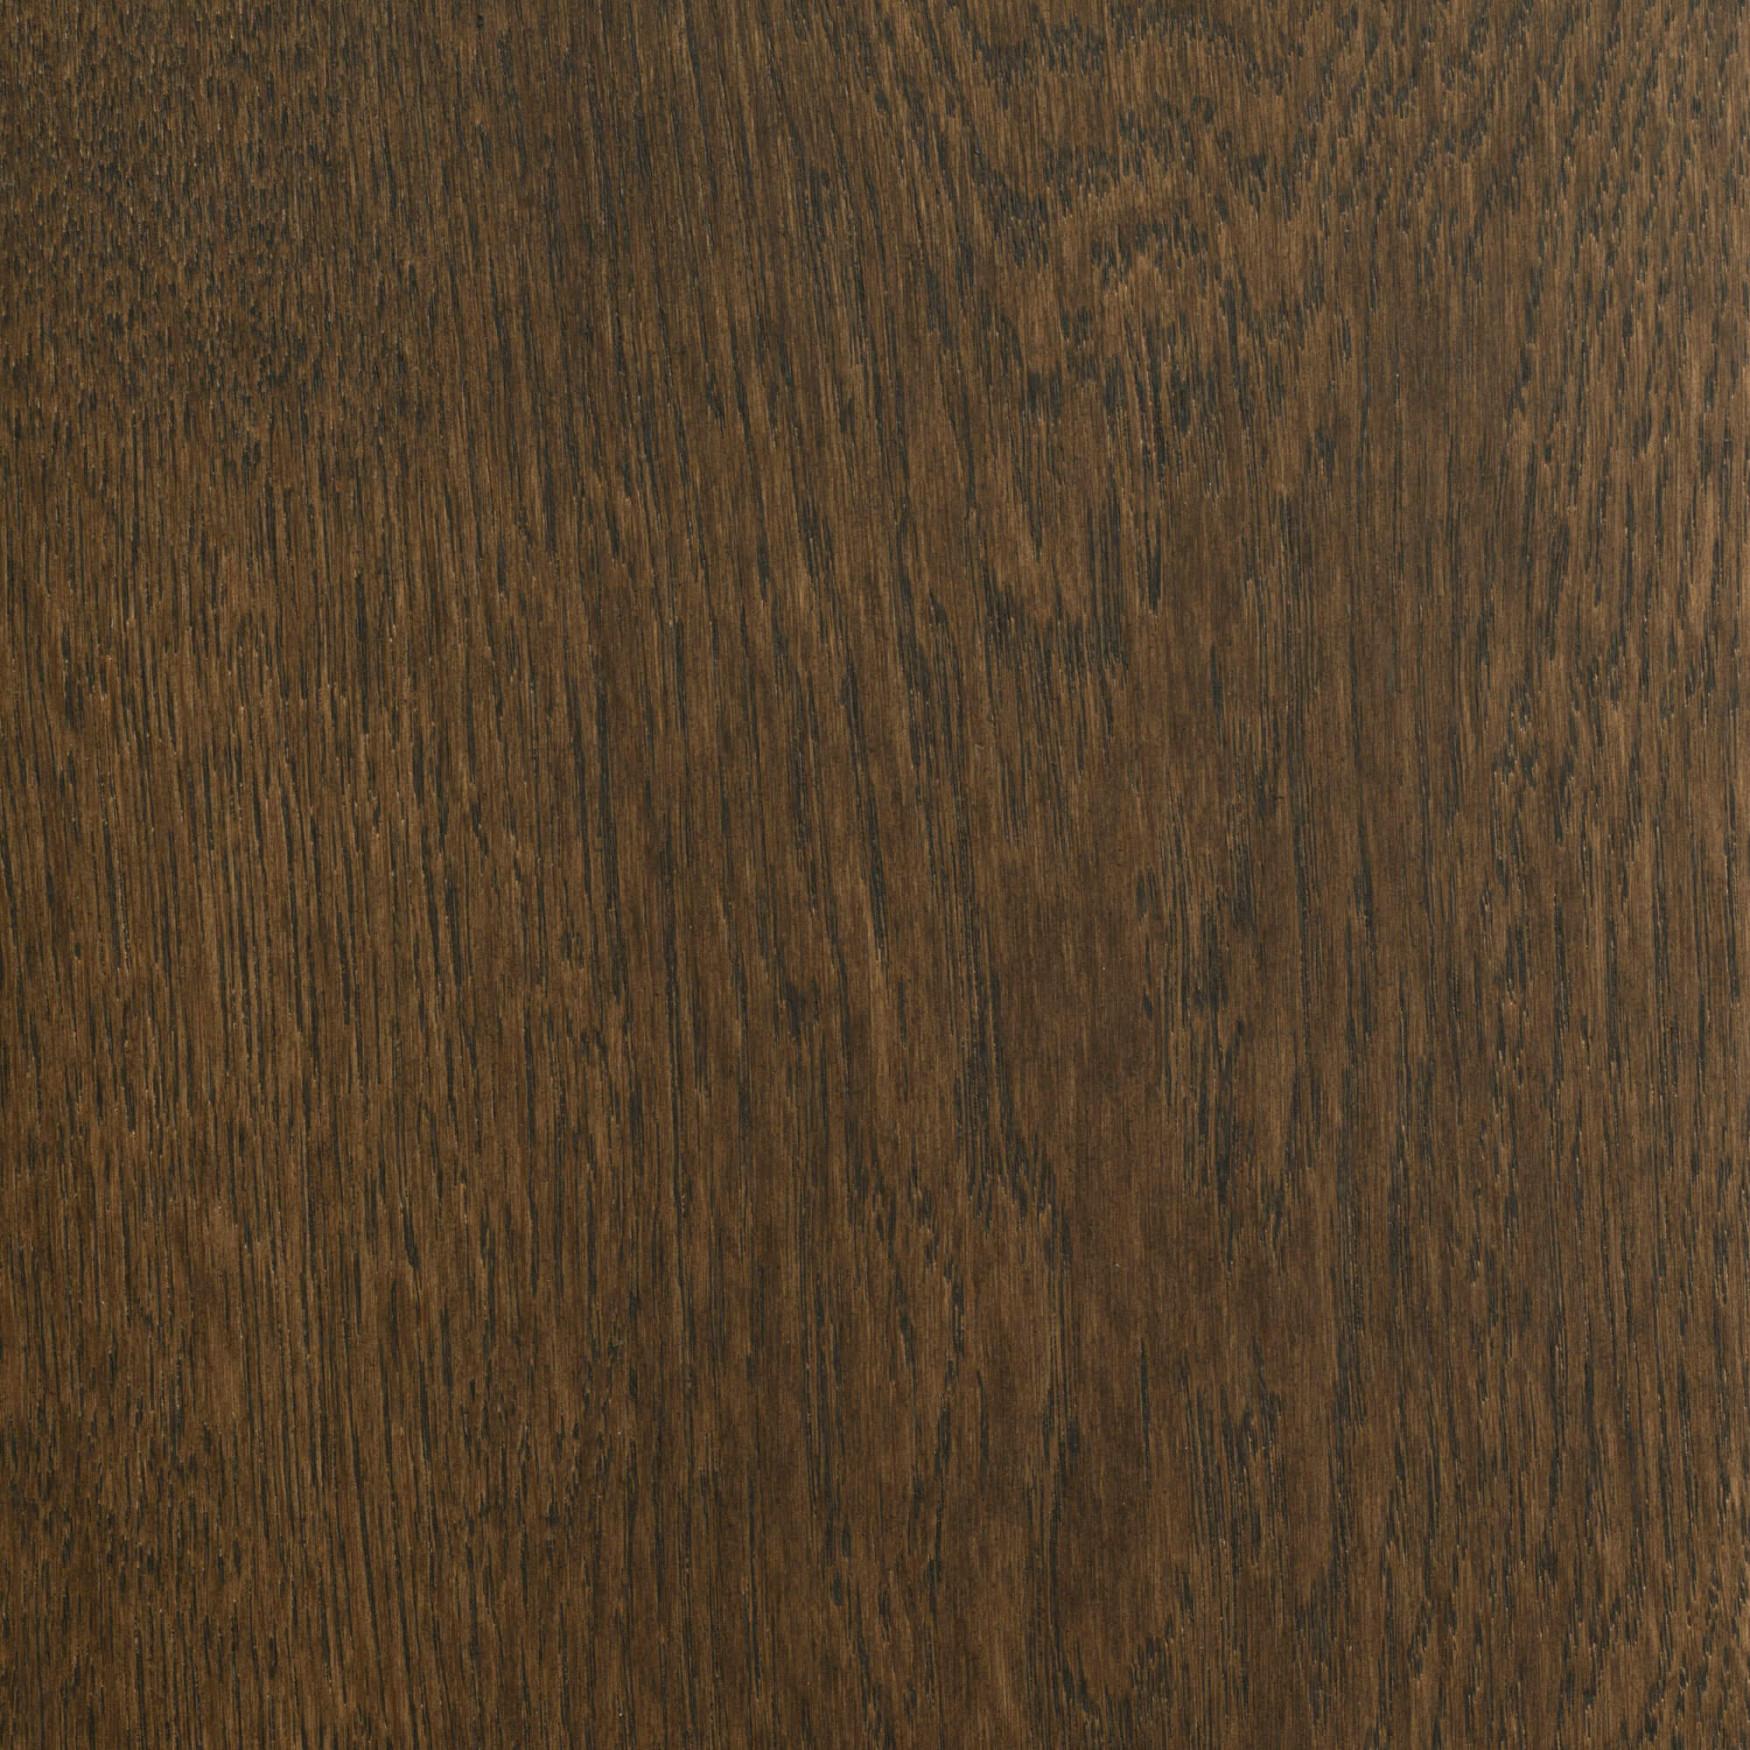 Element7-wide-plank-samples-RT-C-25v3